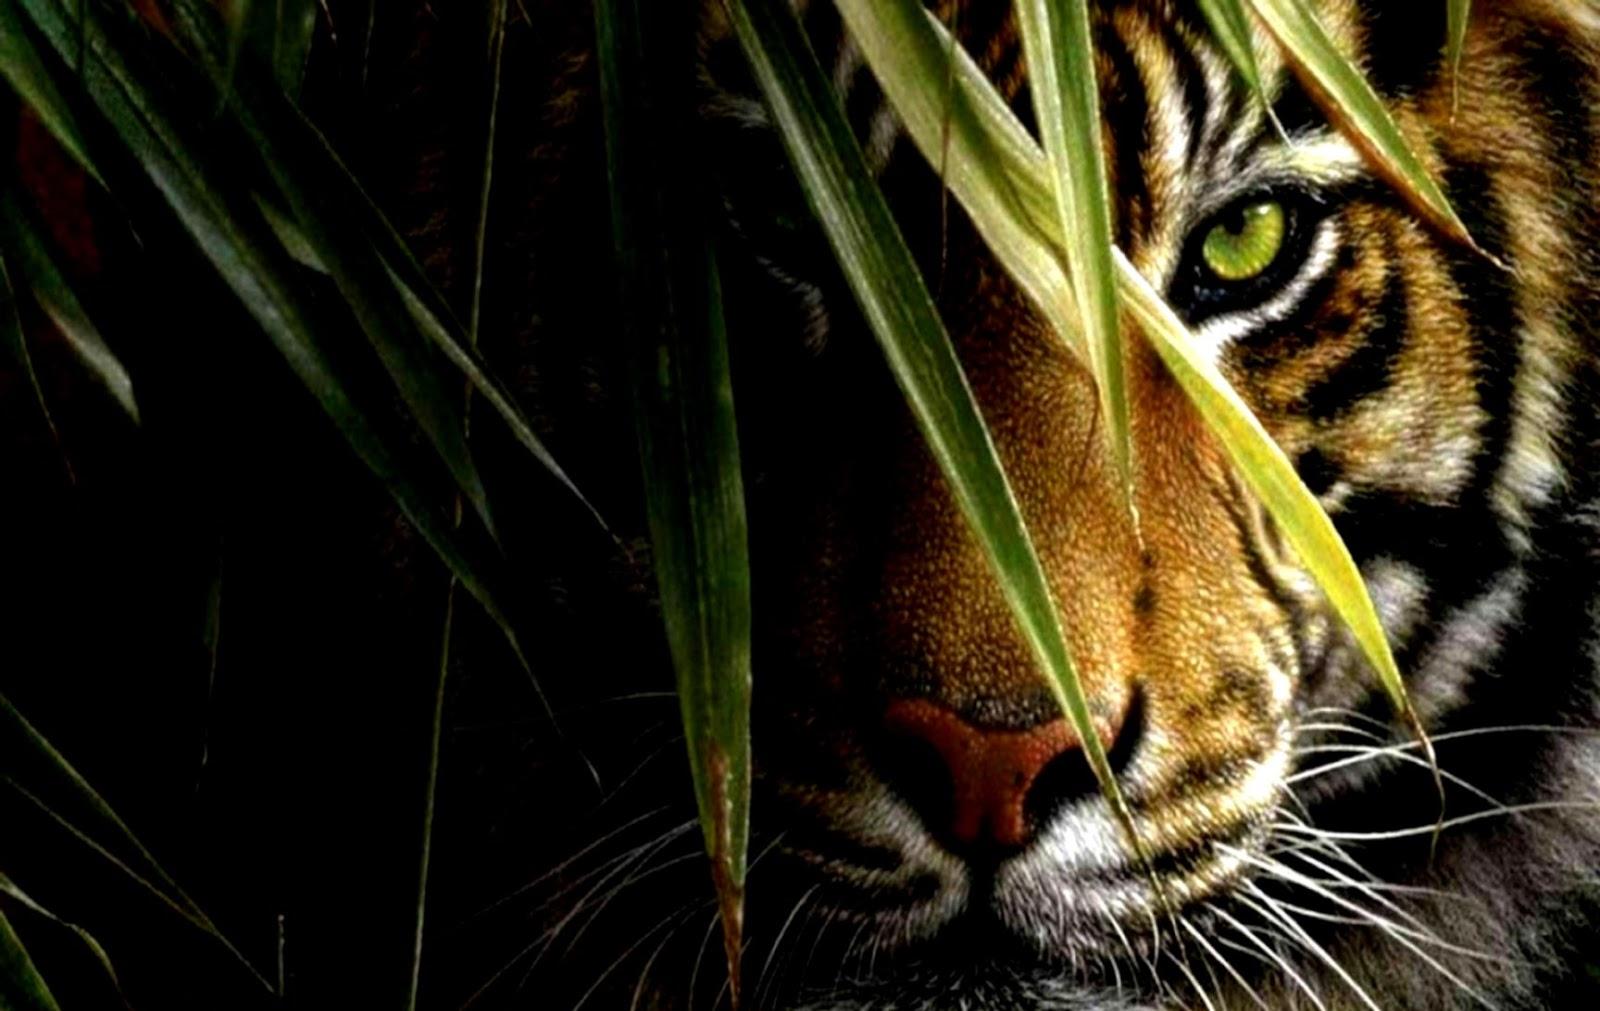 Tiger Wallpaper Hd For Desktop Wallpapers